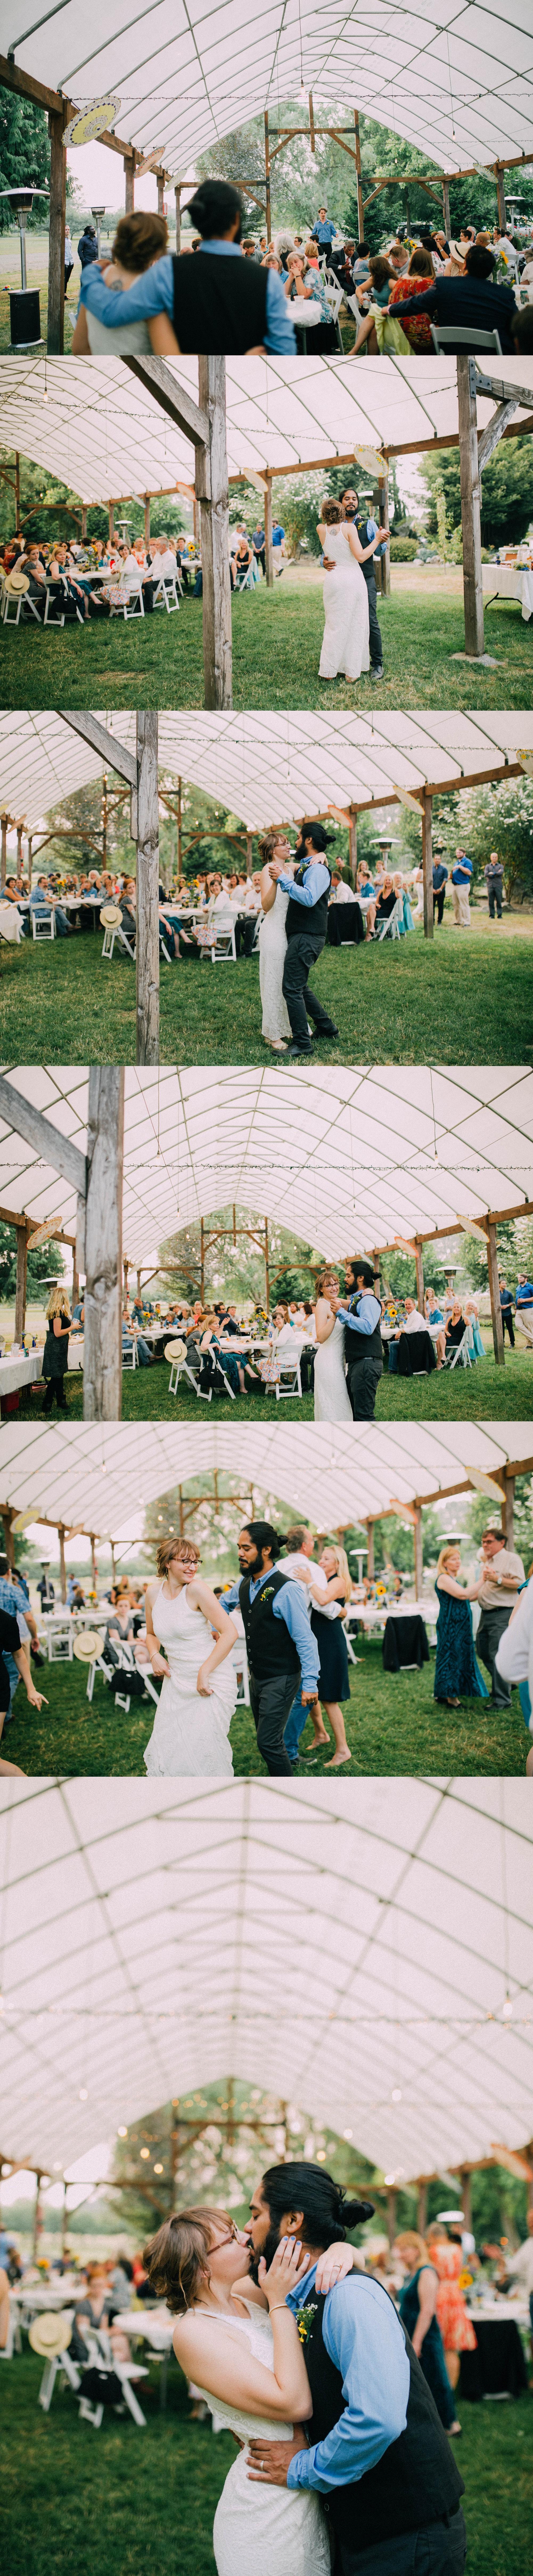 ashley_vos_seattle_ wedding_photographer_0476.jpg